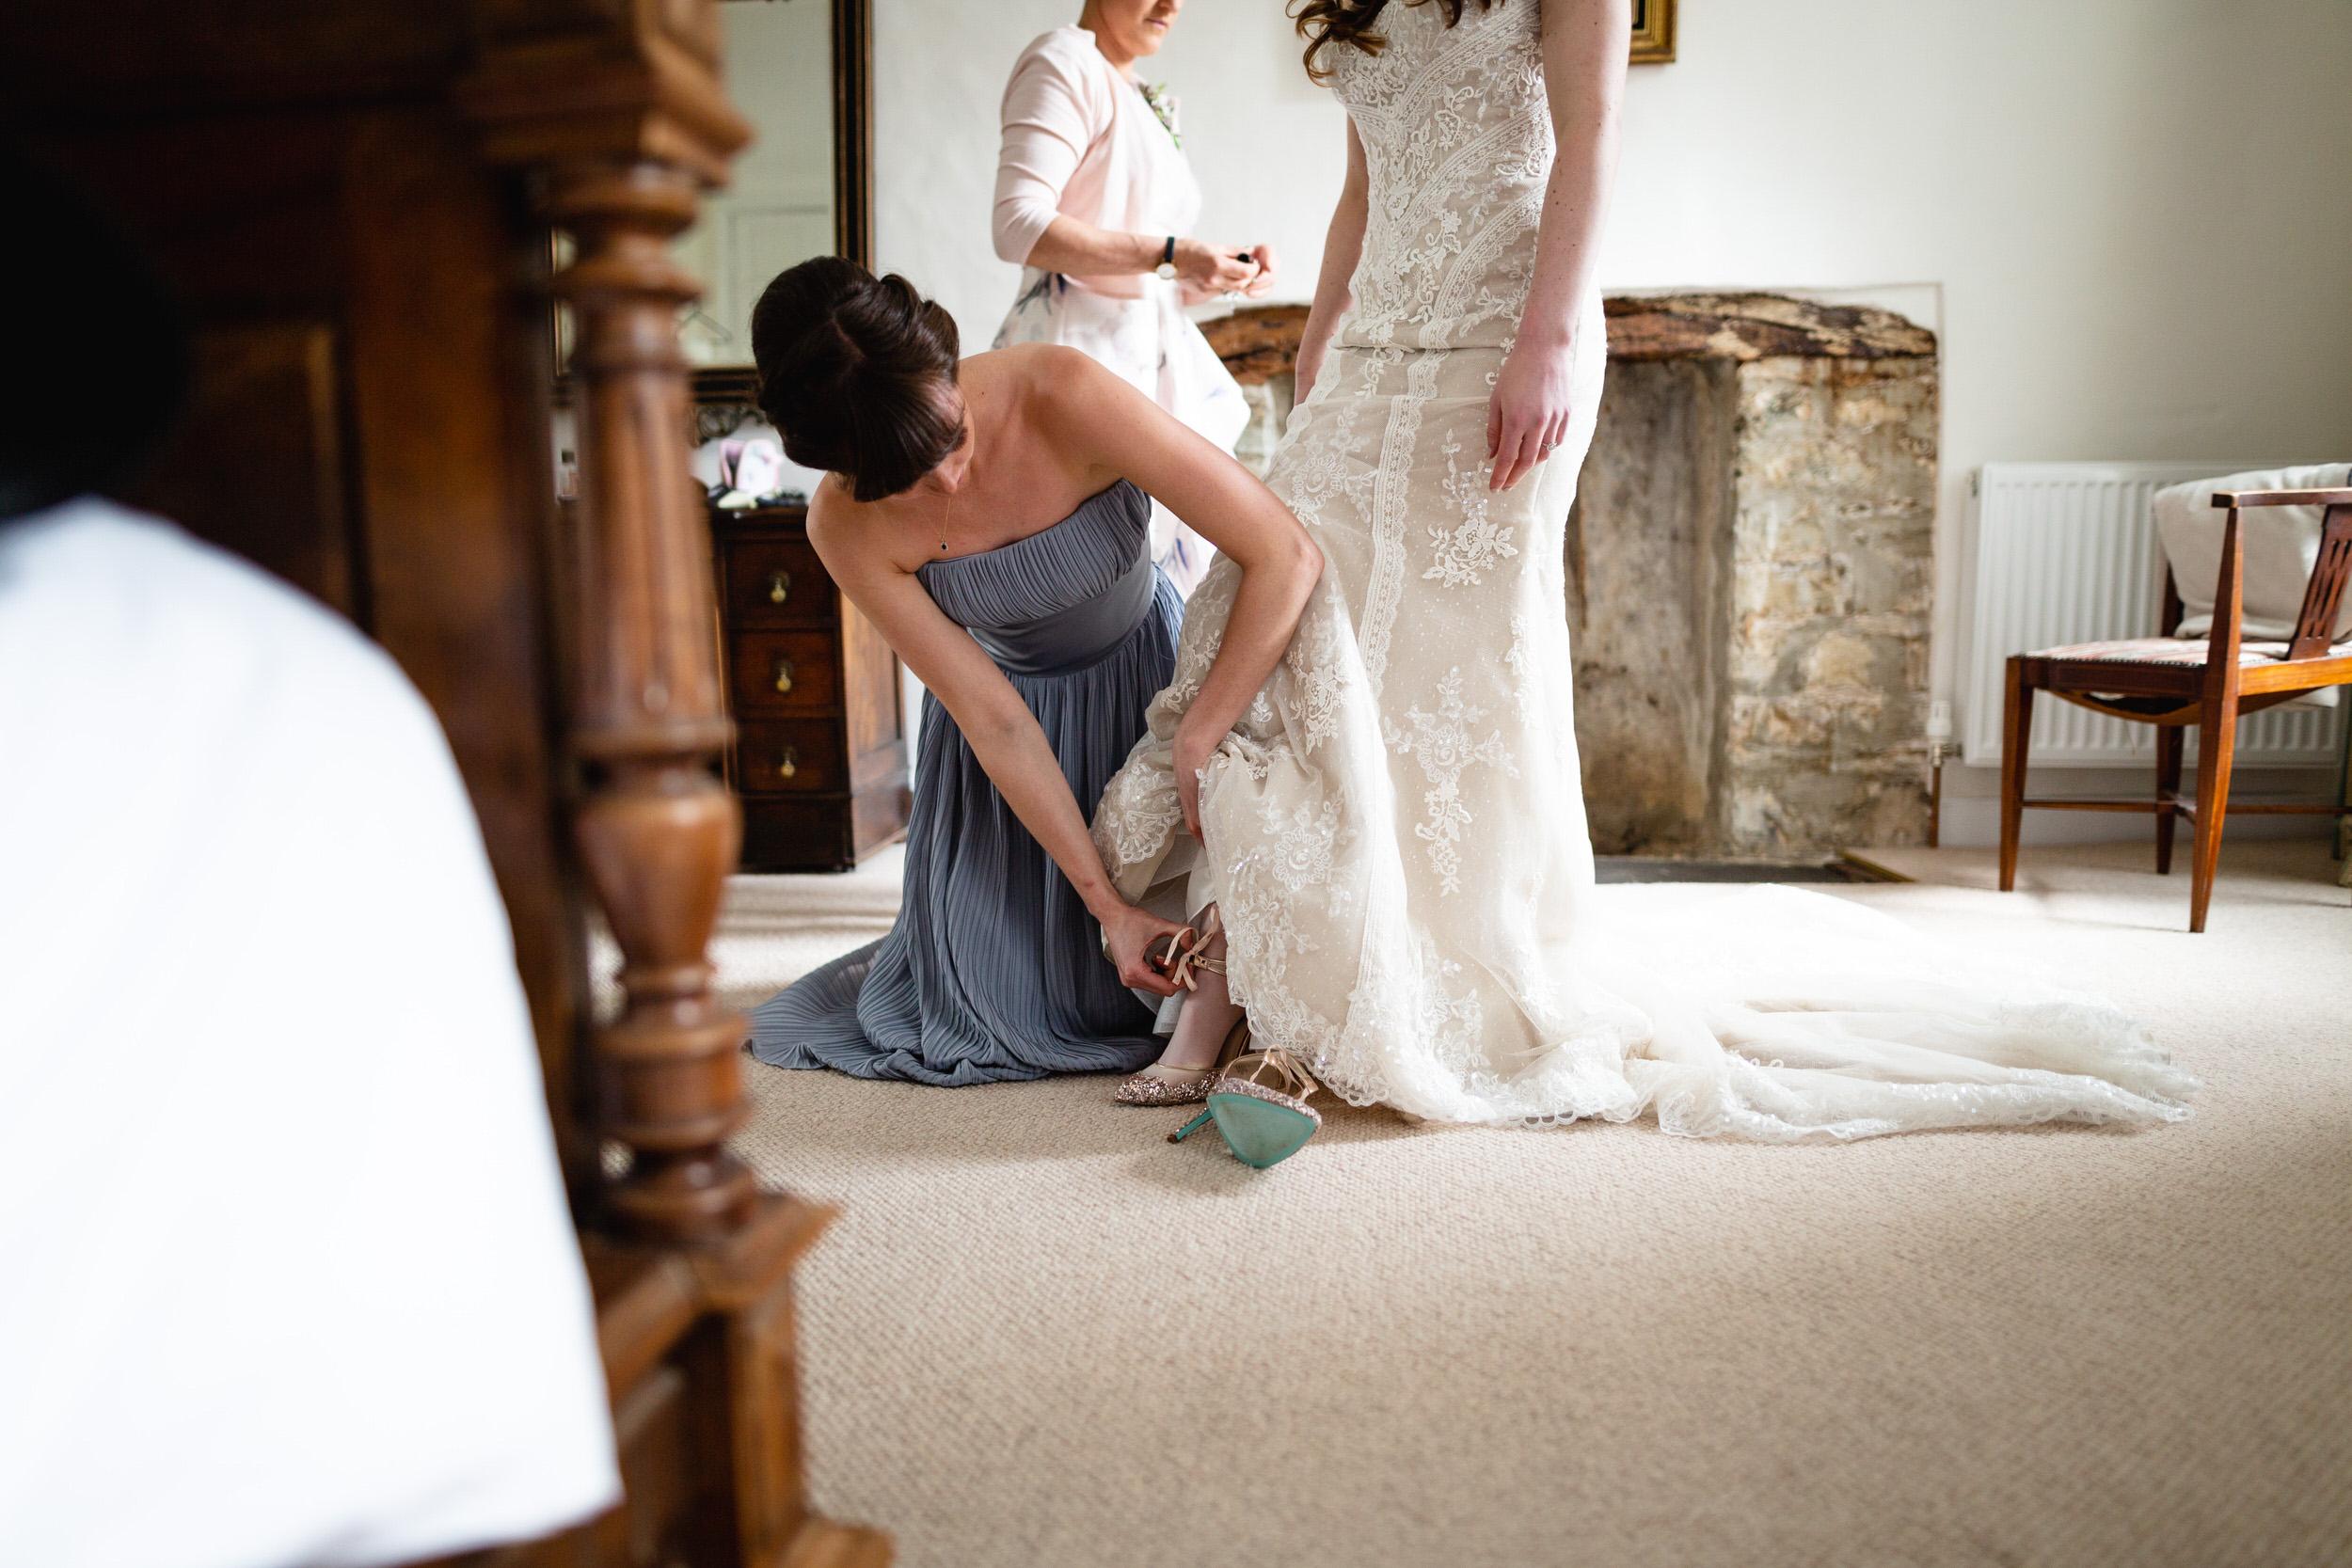 Launcells-Barton-Wedding-Photographer (98).jpg